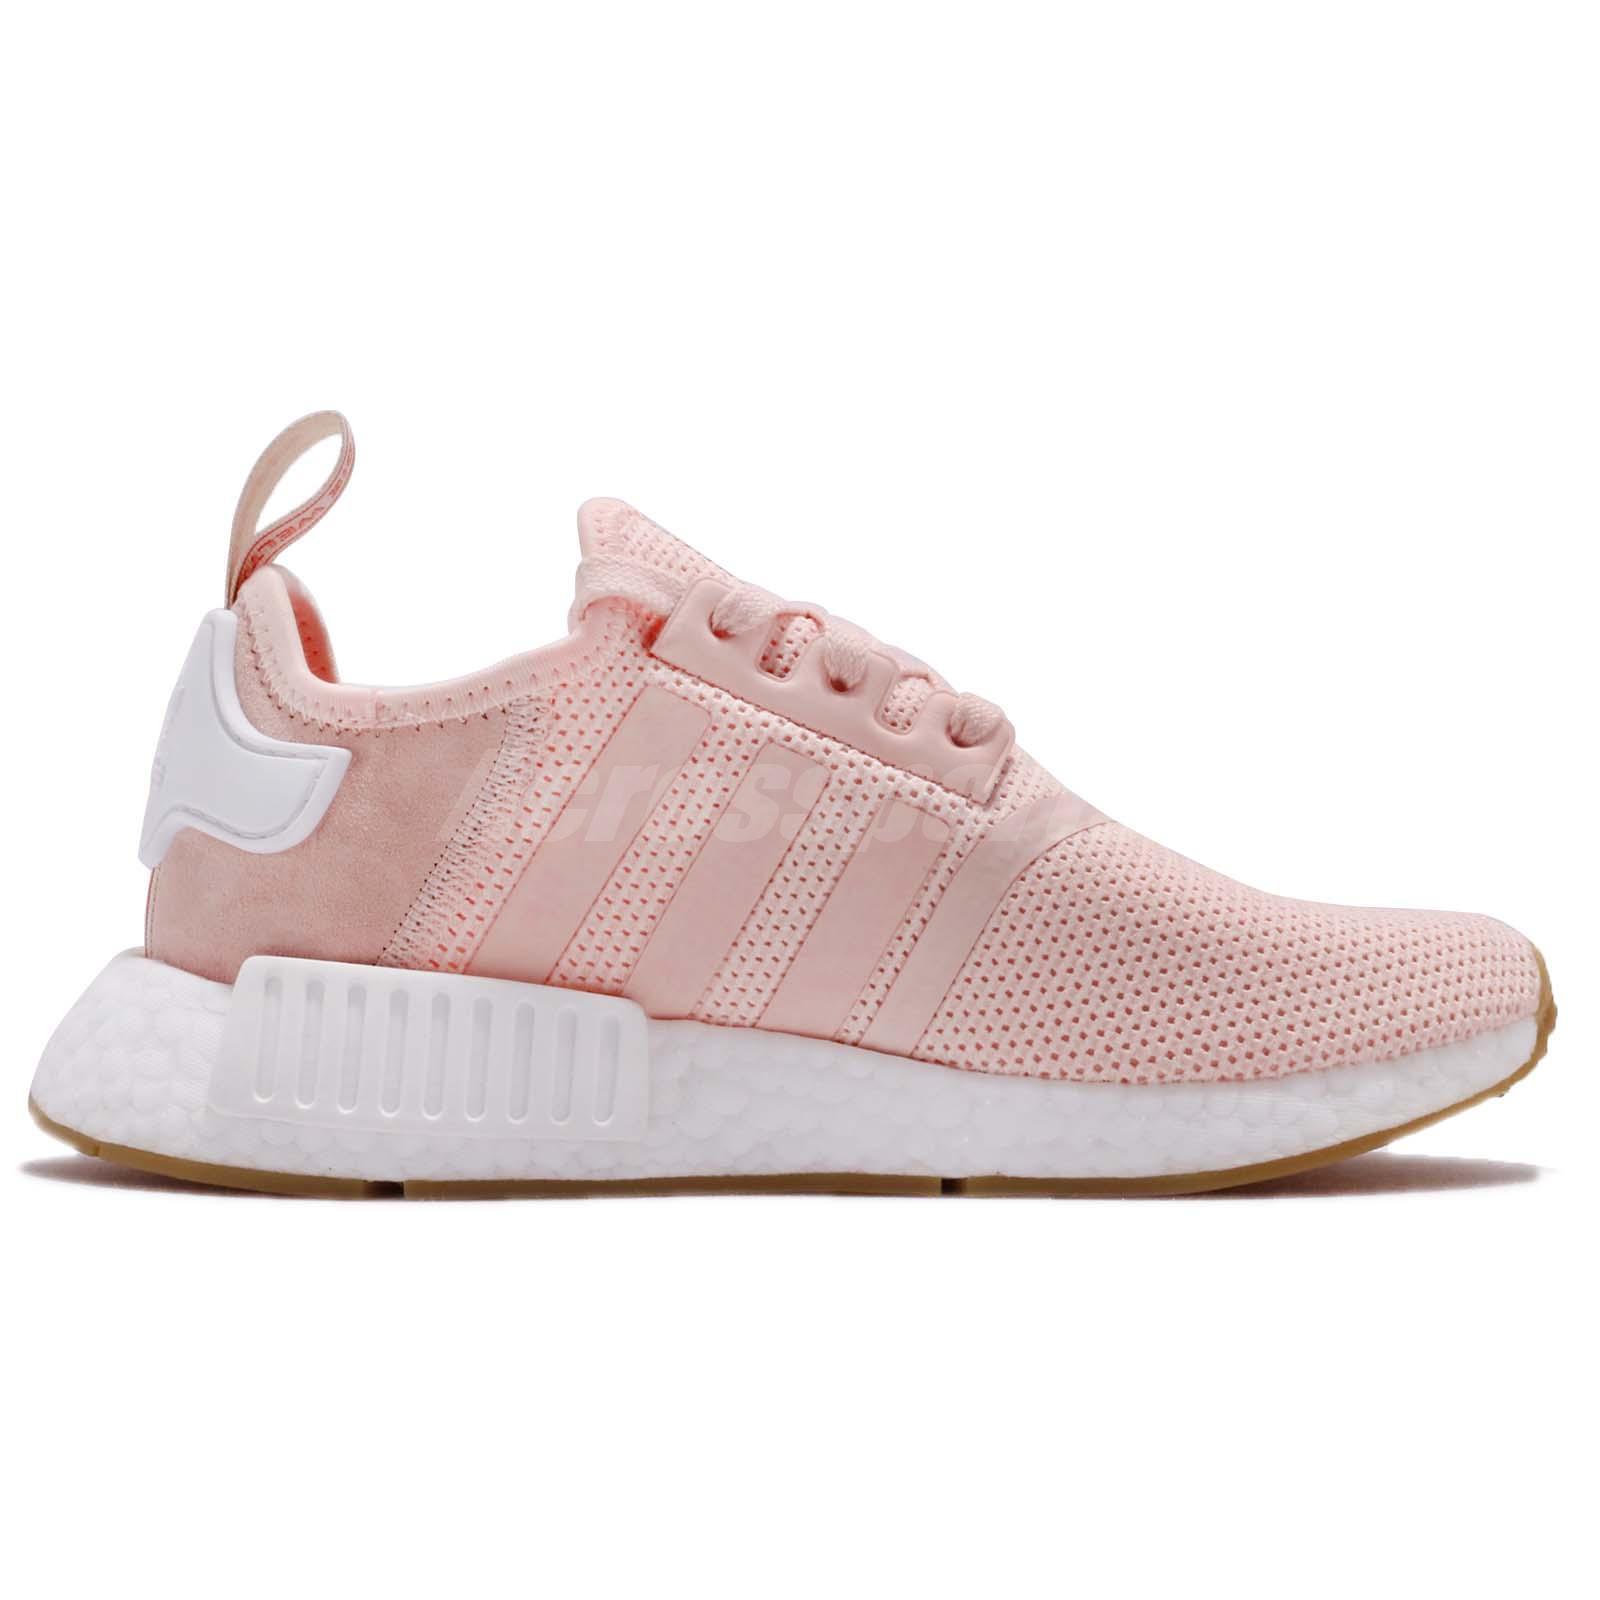 cda7047fc6b adidas Originals NMD R1 W Boost Pink White Gum Women Running Shoe ...